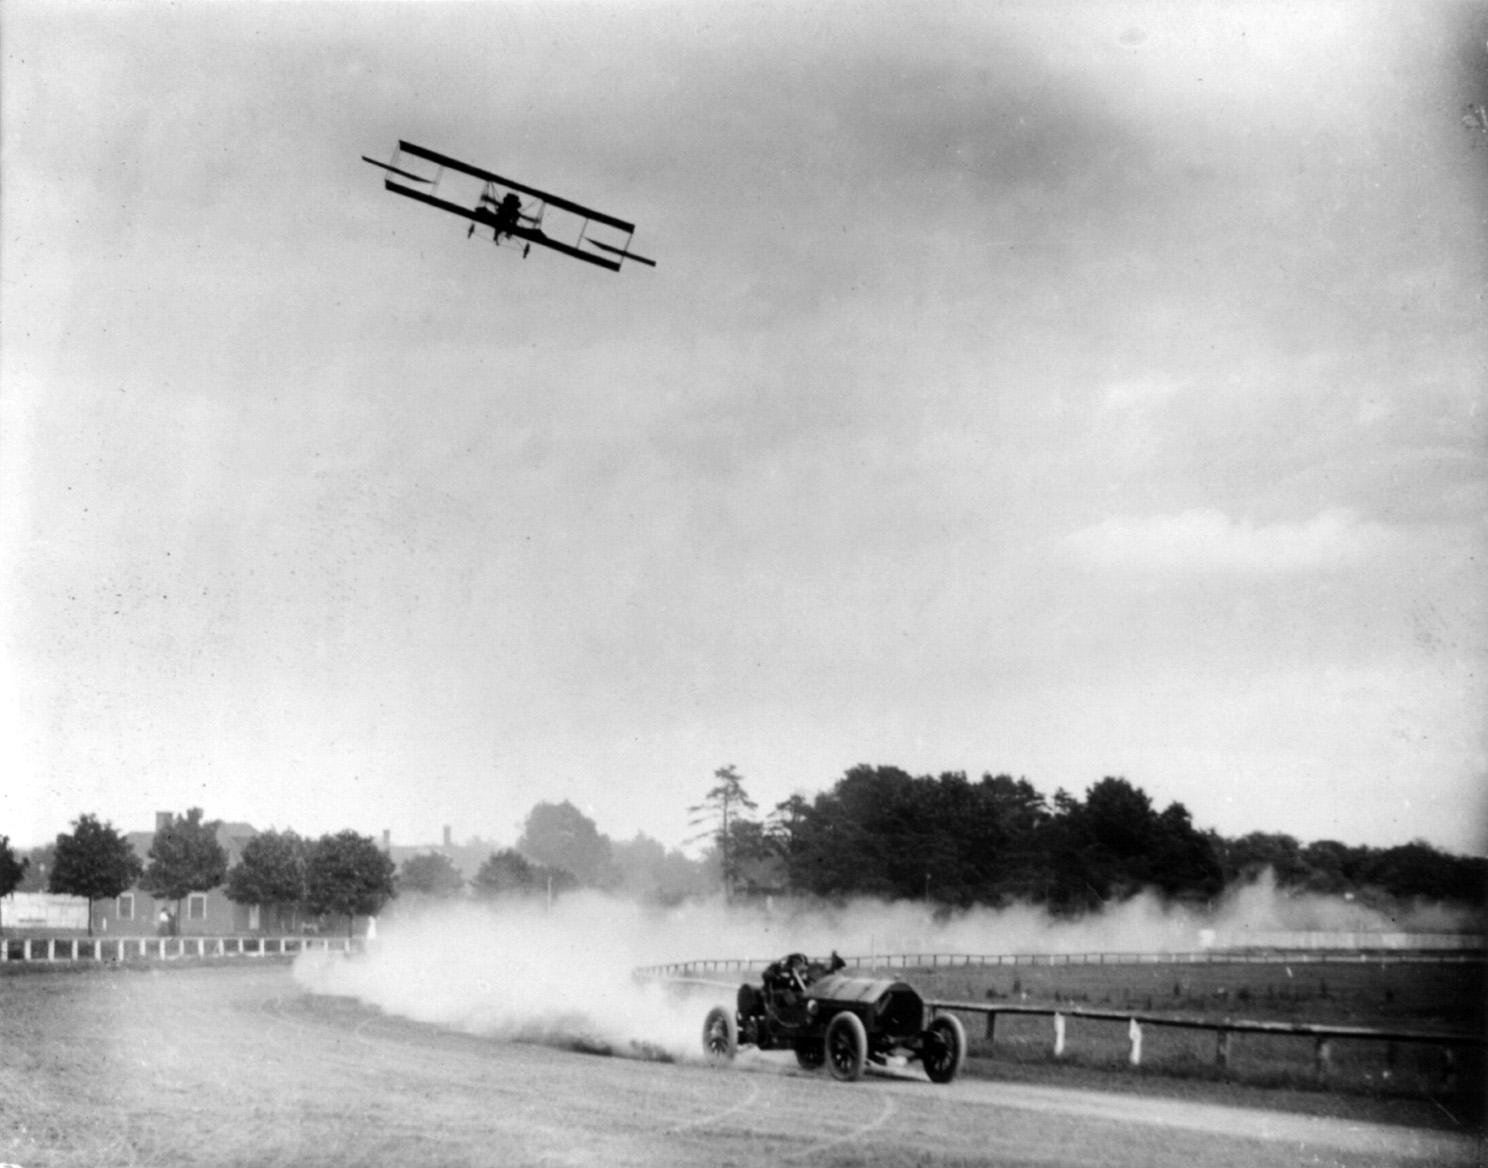 Barney Oldfield Race Car